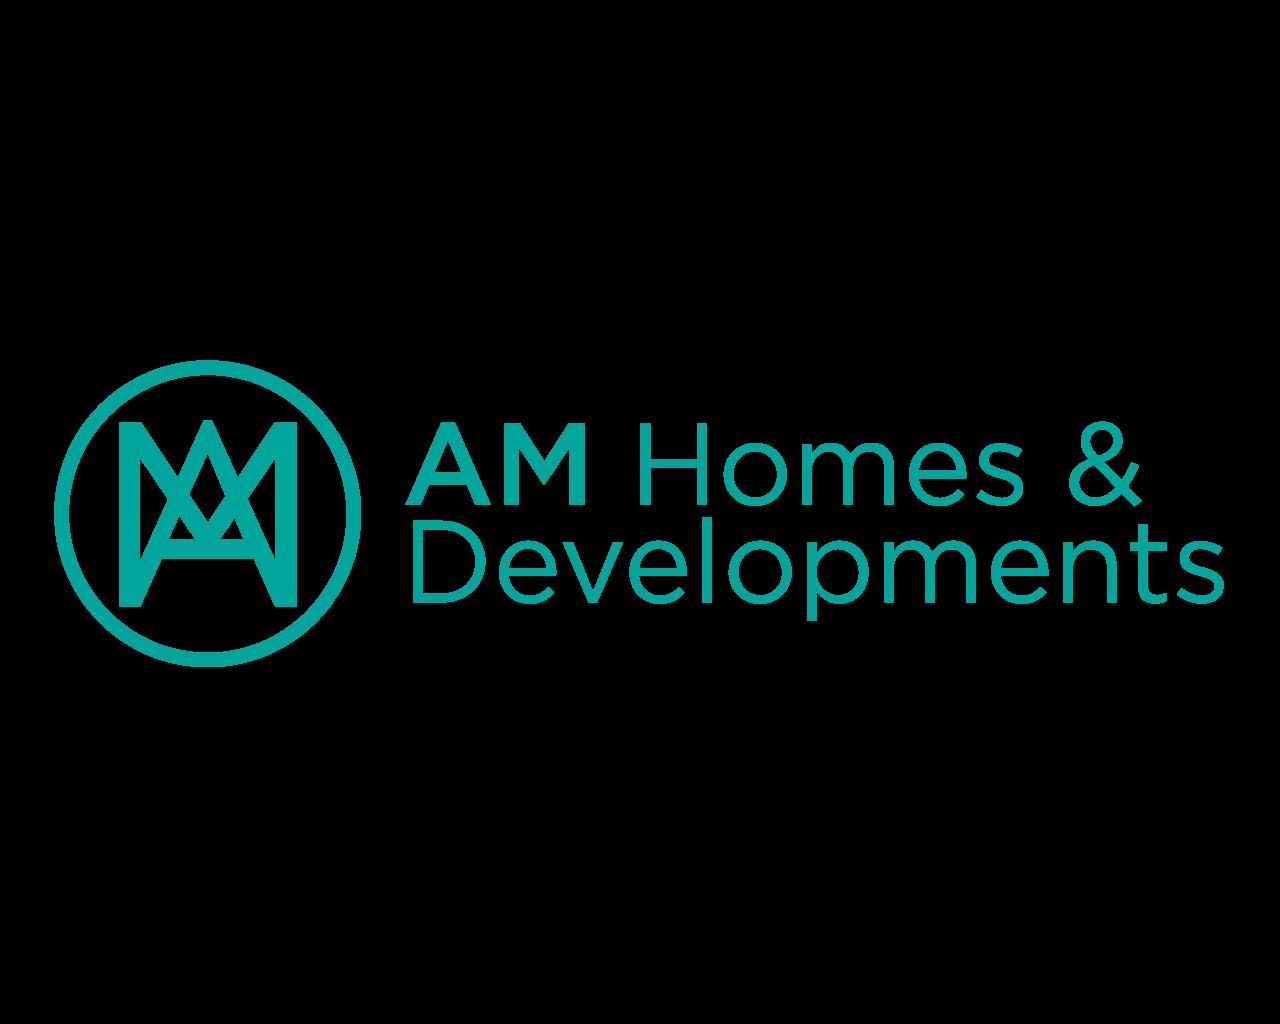 AM-Homes